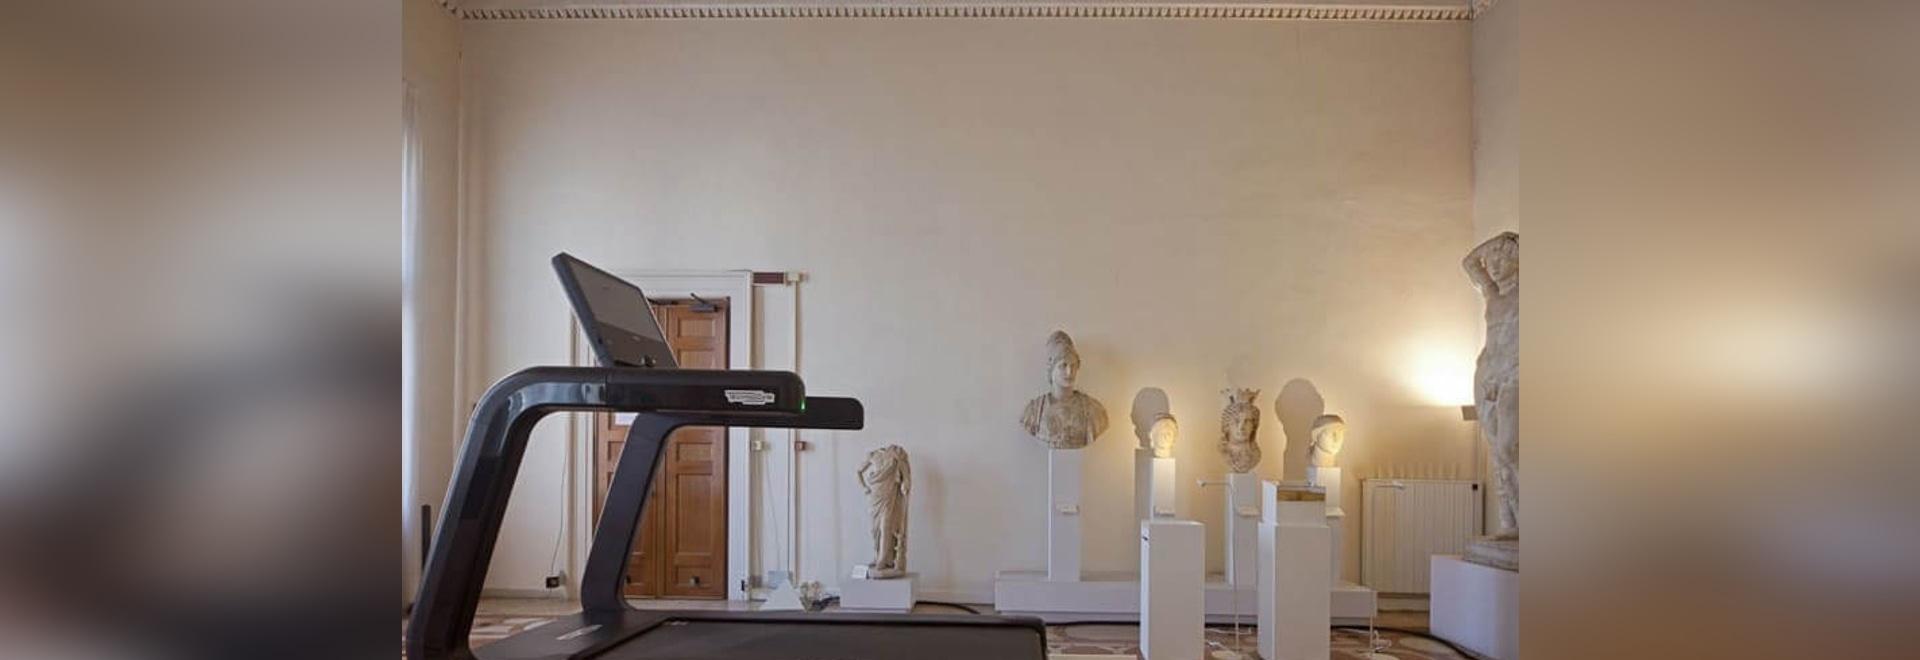 Art in Motion, Technogym ARTIS RUN to Venice's  Biennale